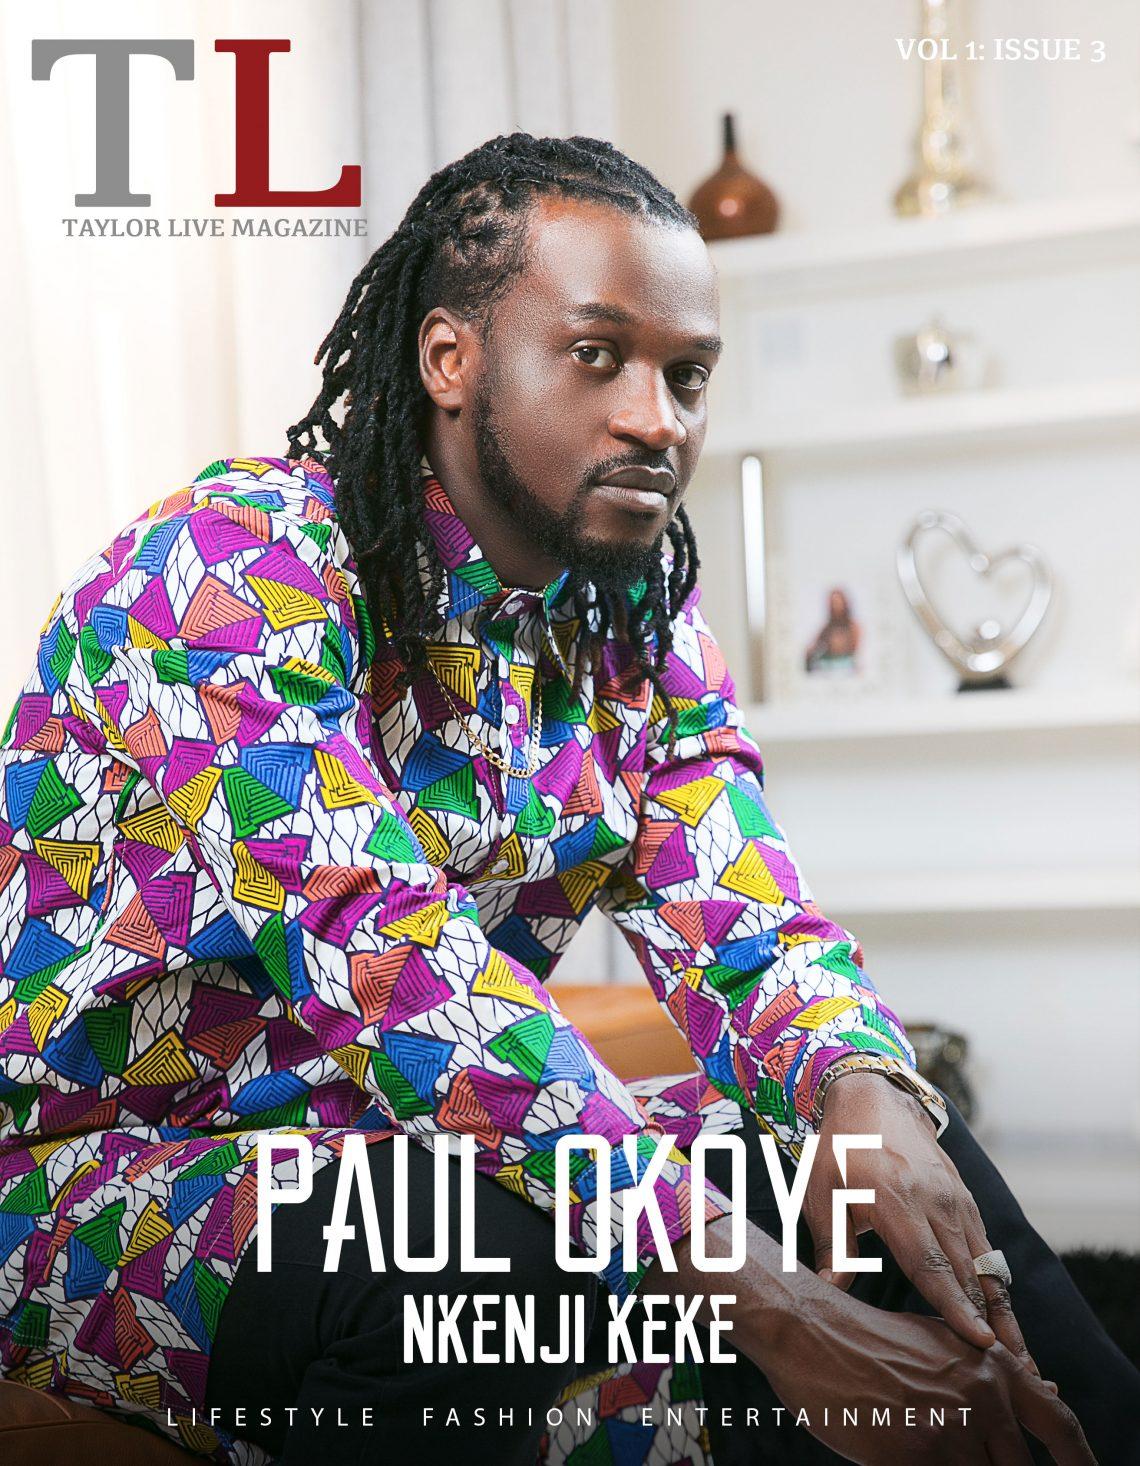 Nkenji Keke! Paul Okoye Covers Taylor Live Magazine's Latest Issue